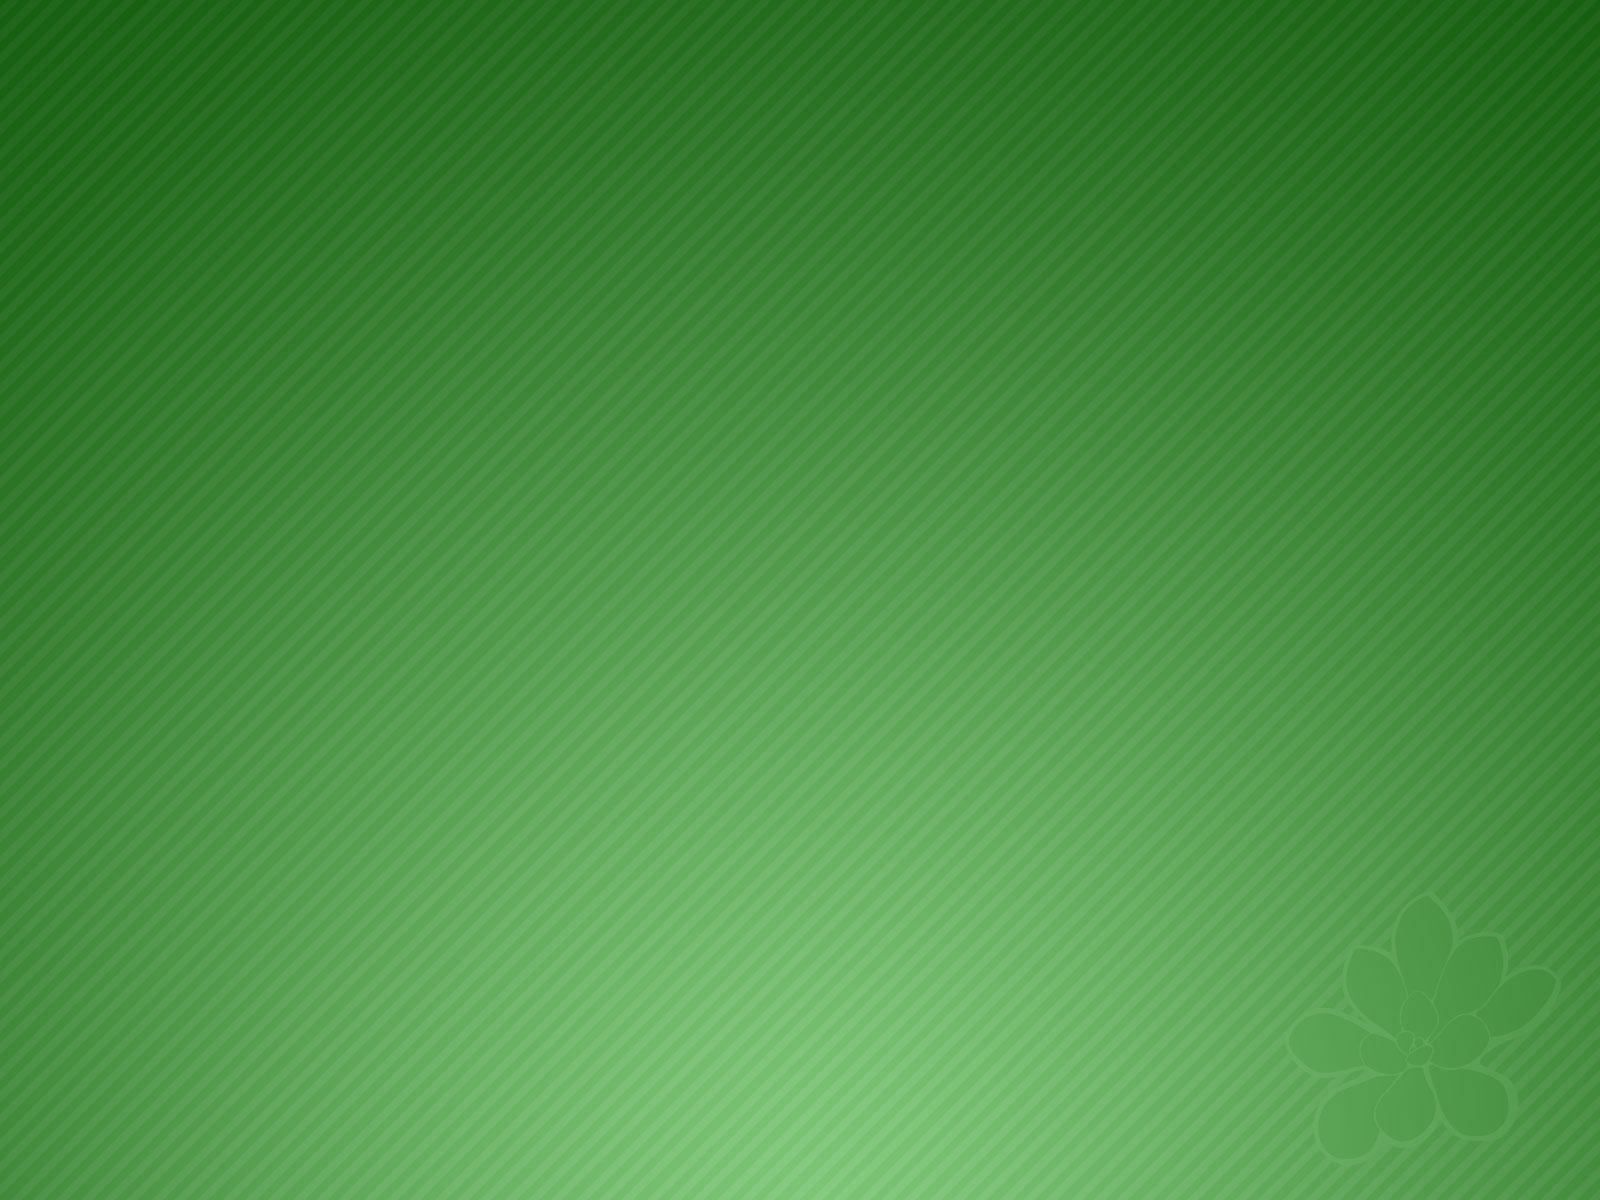 1600x1200 Green style desktop PC and Mac wallpaper 1600x1200